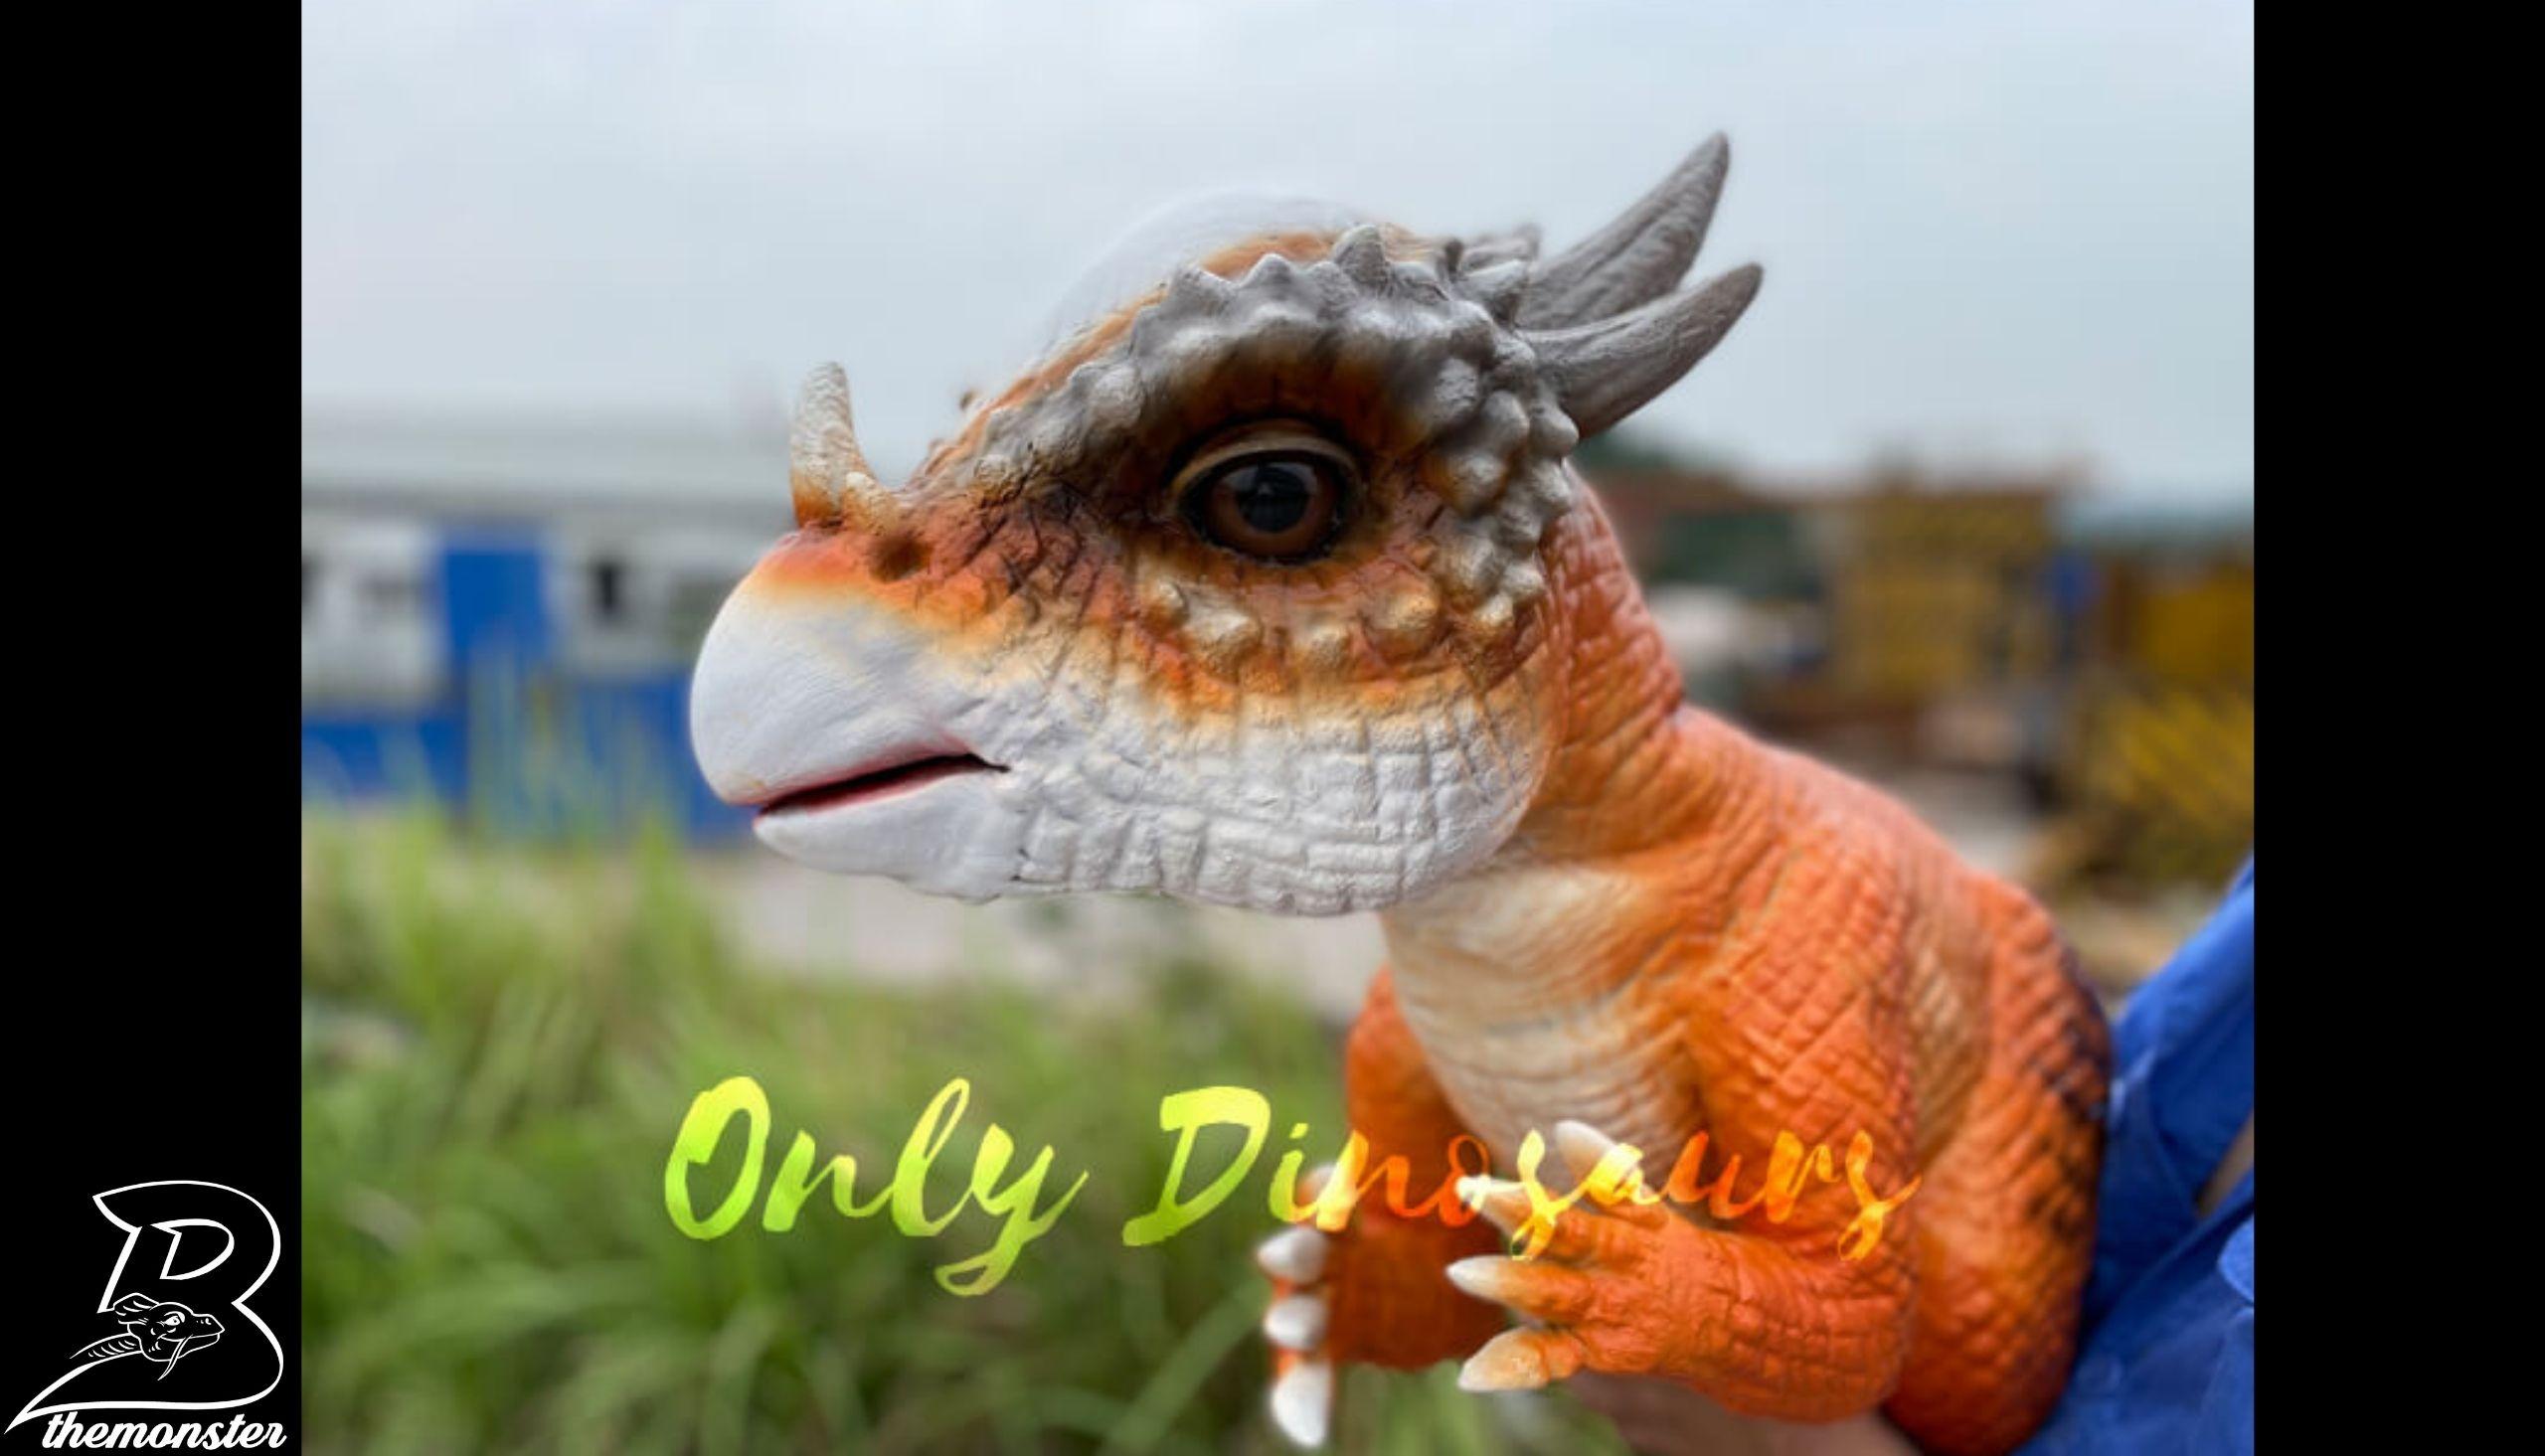 Adorable Baby Stygimoloch Dino Hand Puppet in vendita sul Bthemonster.com